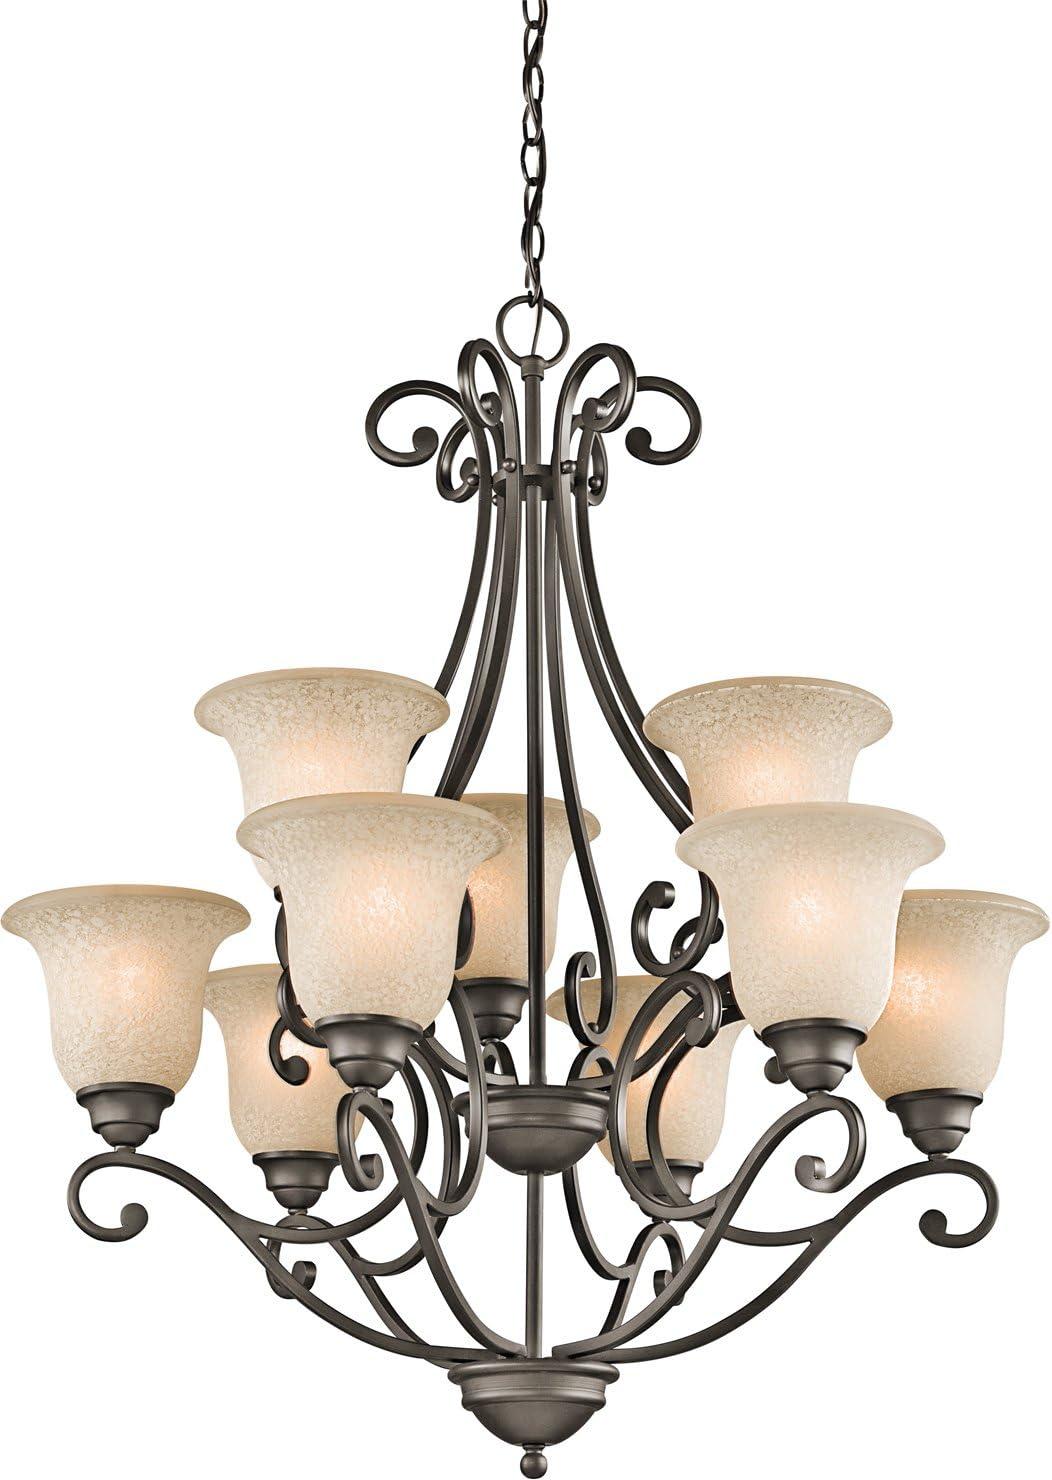 Kichler 43226OZ Camerena Large Chandelier Lighting, Olde Bronze 9-Light 30 W x 35 H 900 Watts